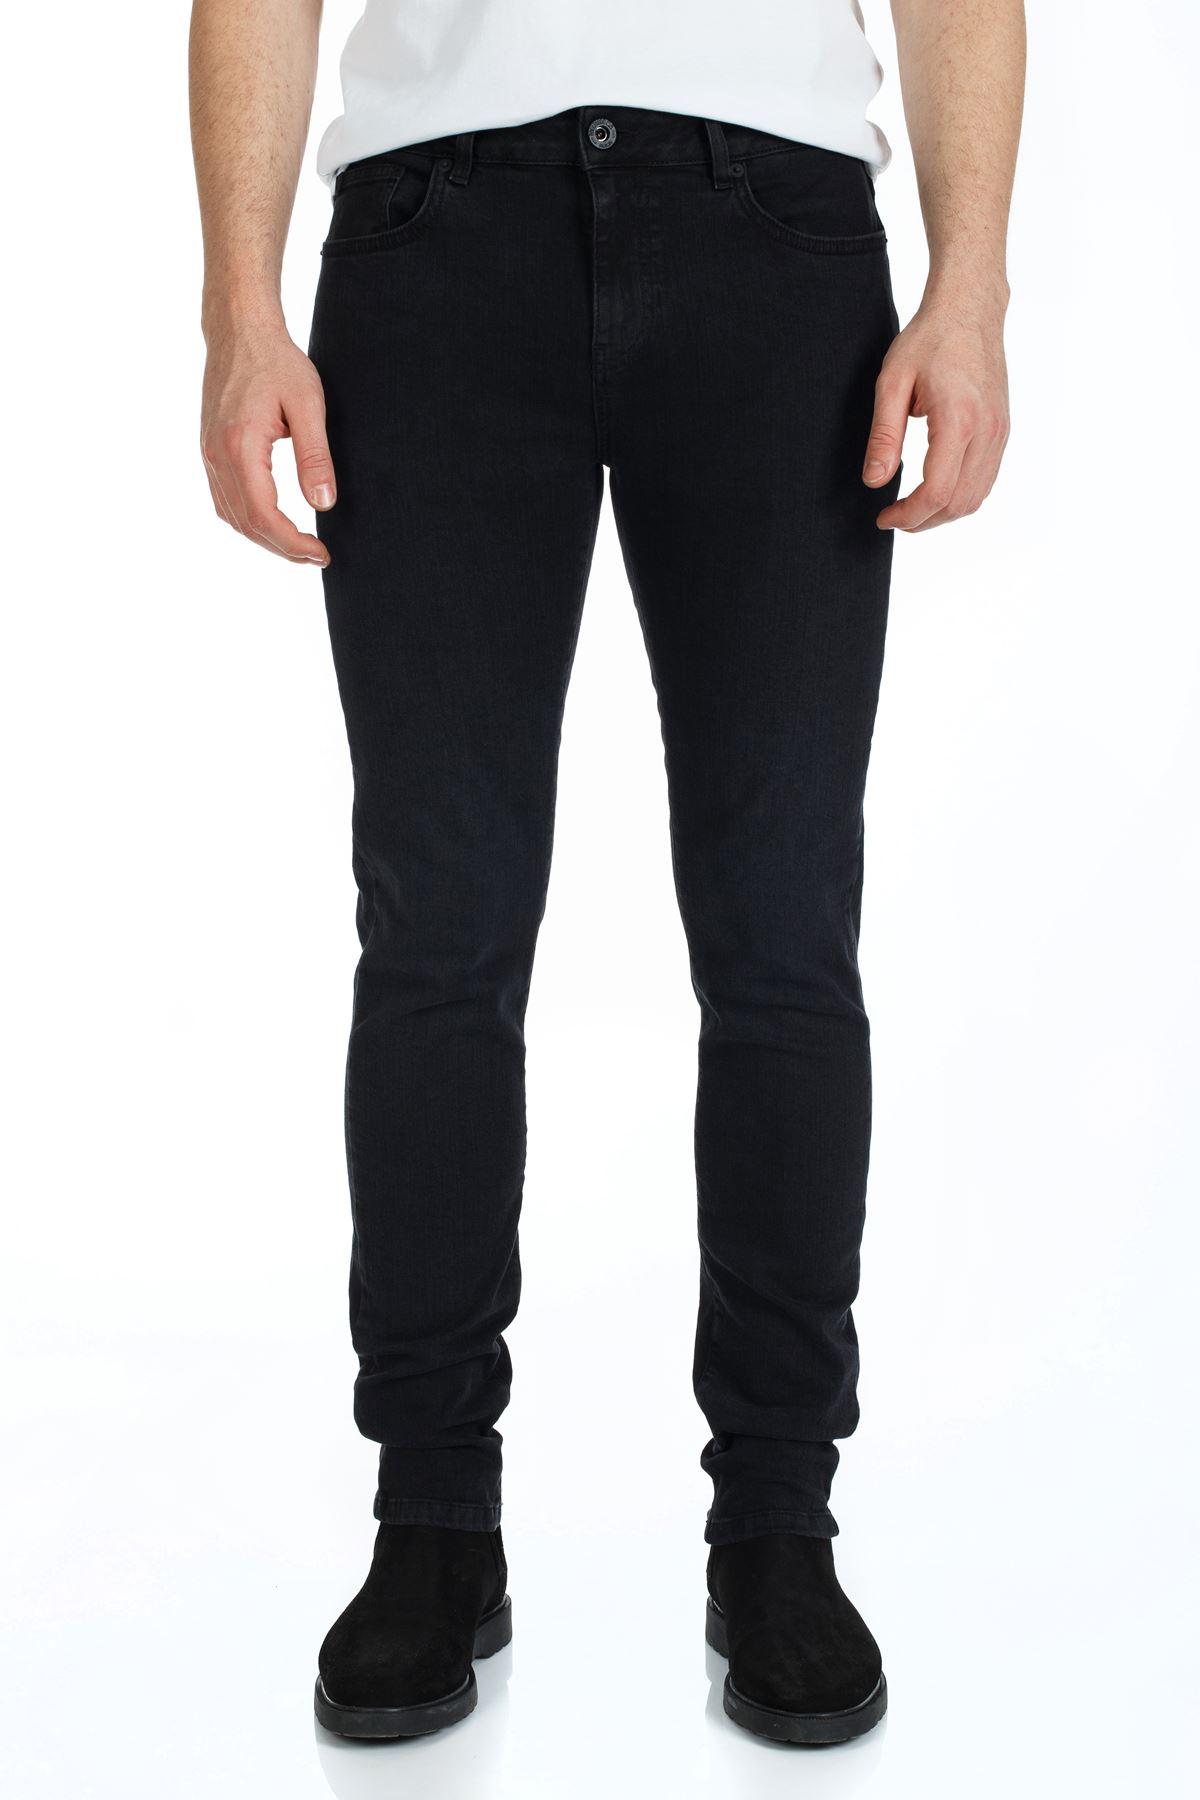 Black Slim Kalıp Denim Kot Pantolon